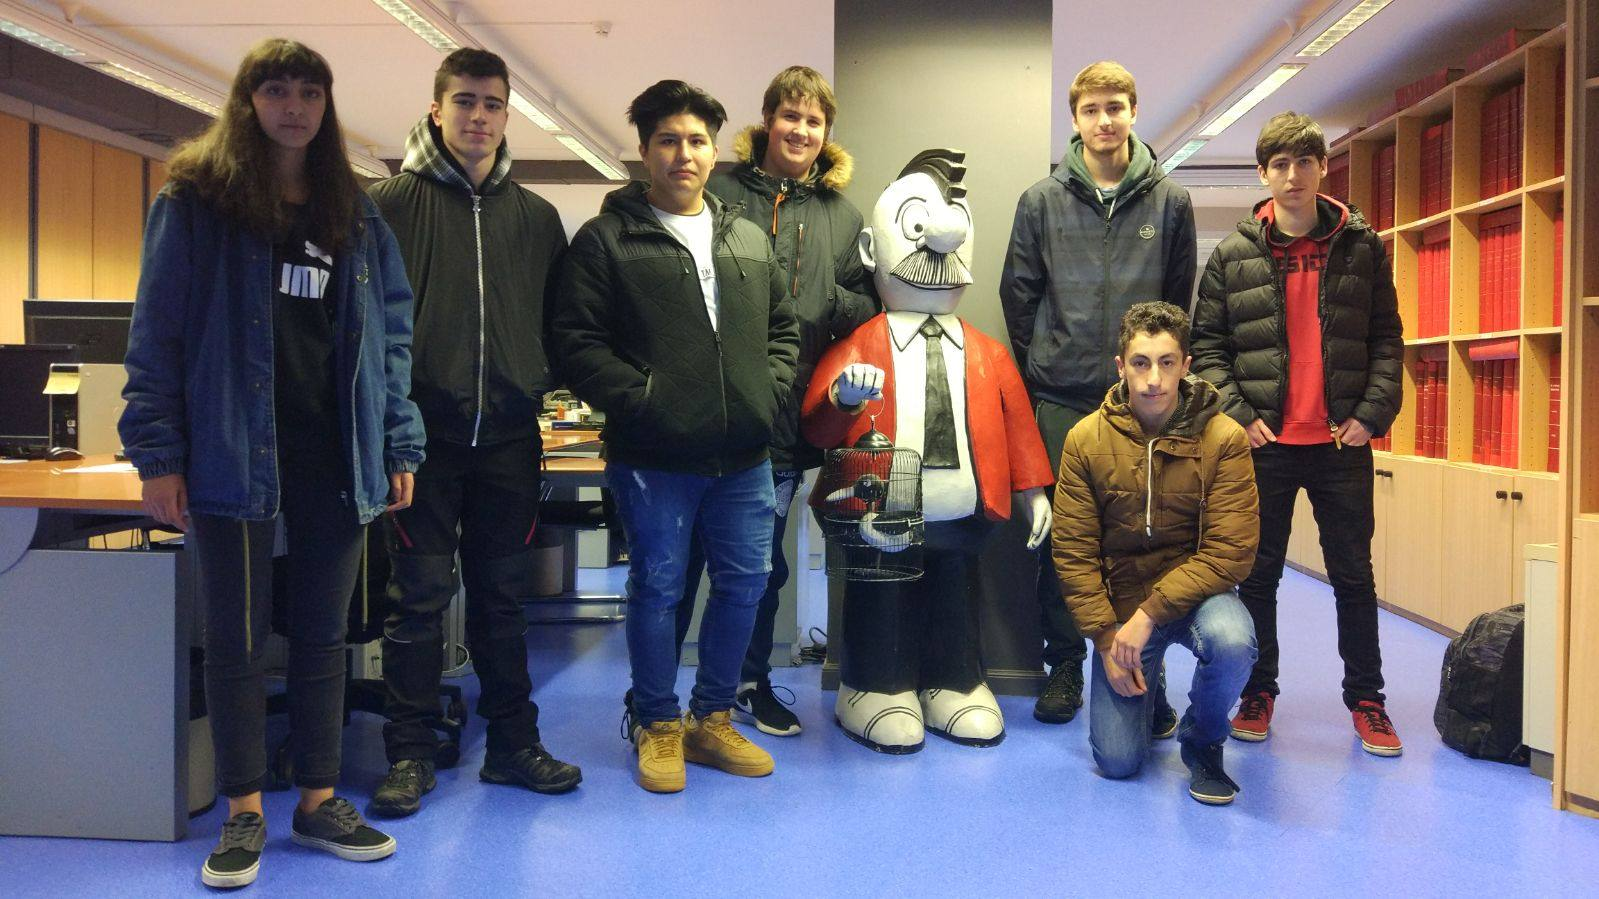 Visita centro escolar Jesús Obrero (Vitoria-Gasteiz) - 23 de enero de 2018